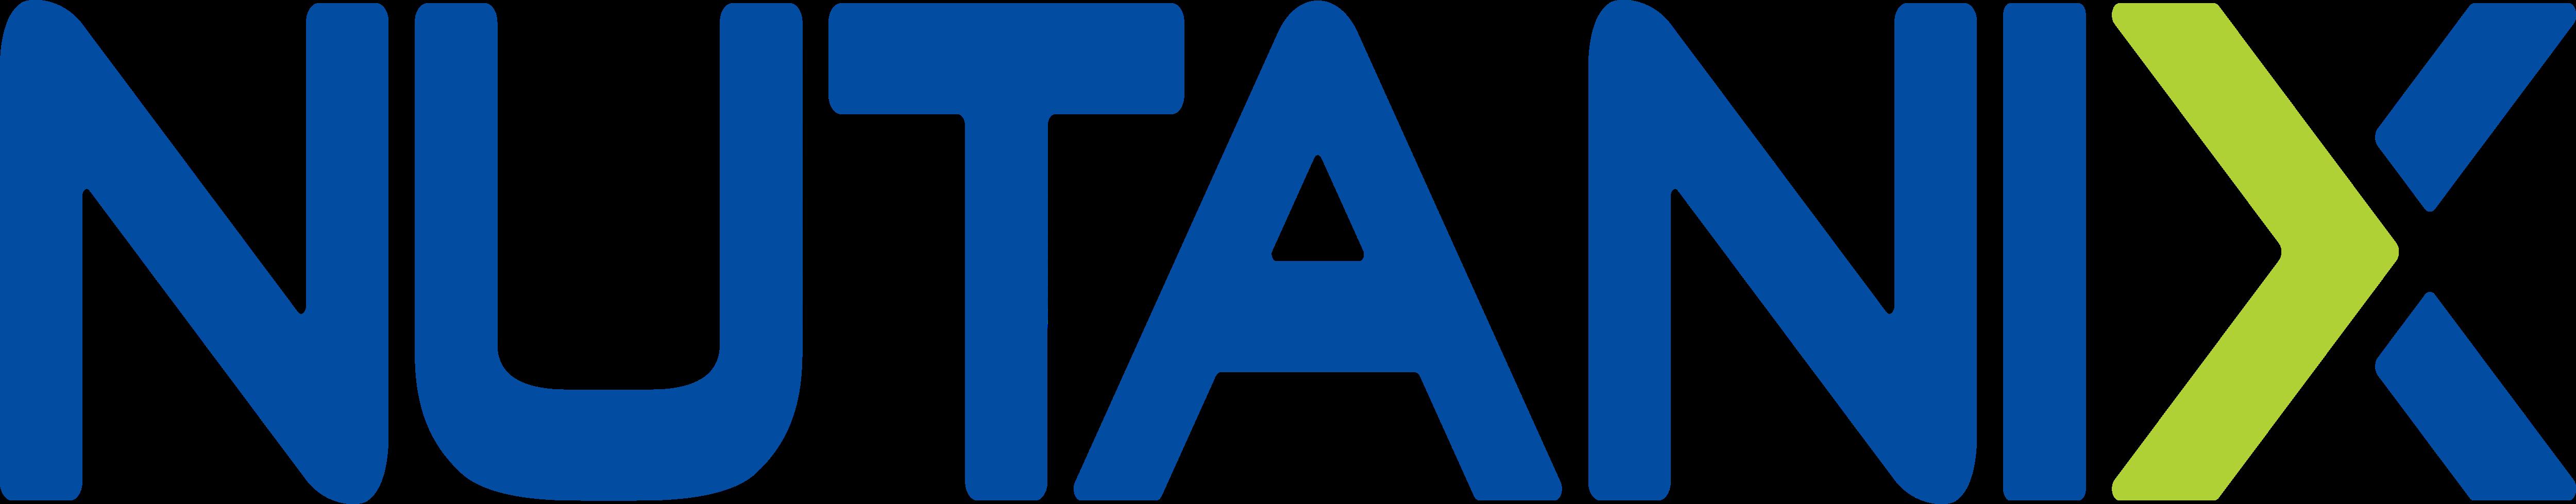 Nutanix_Logo_blue